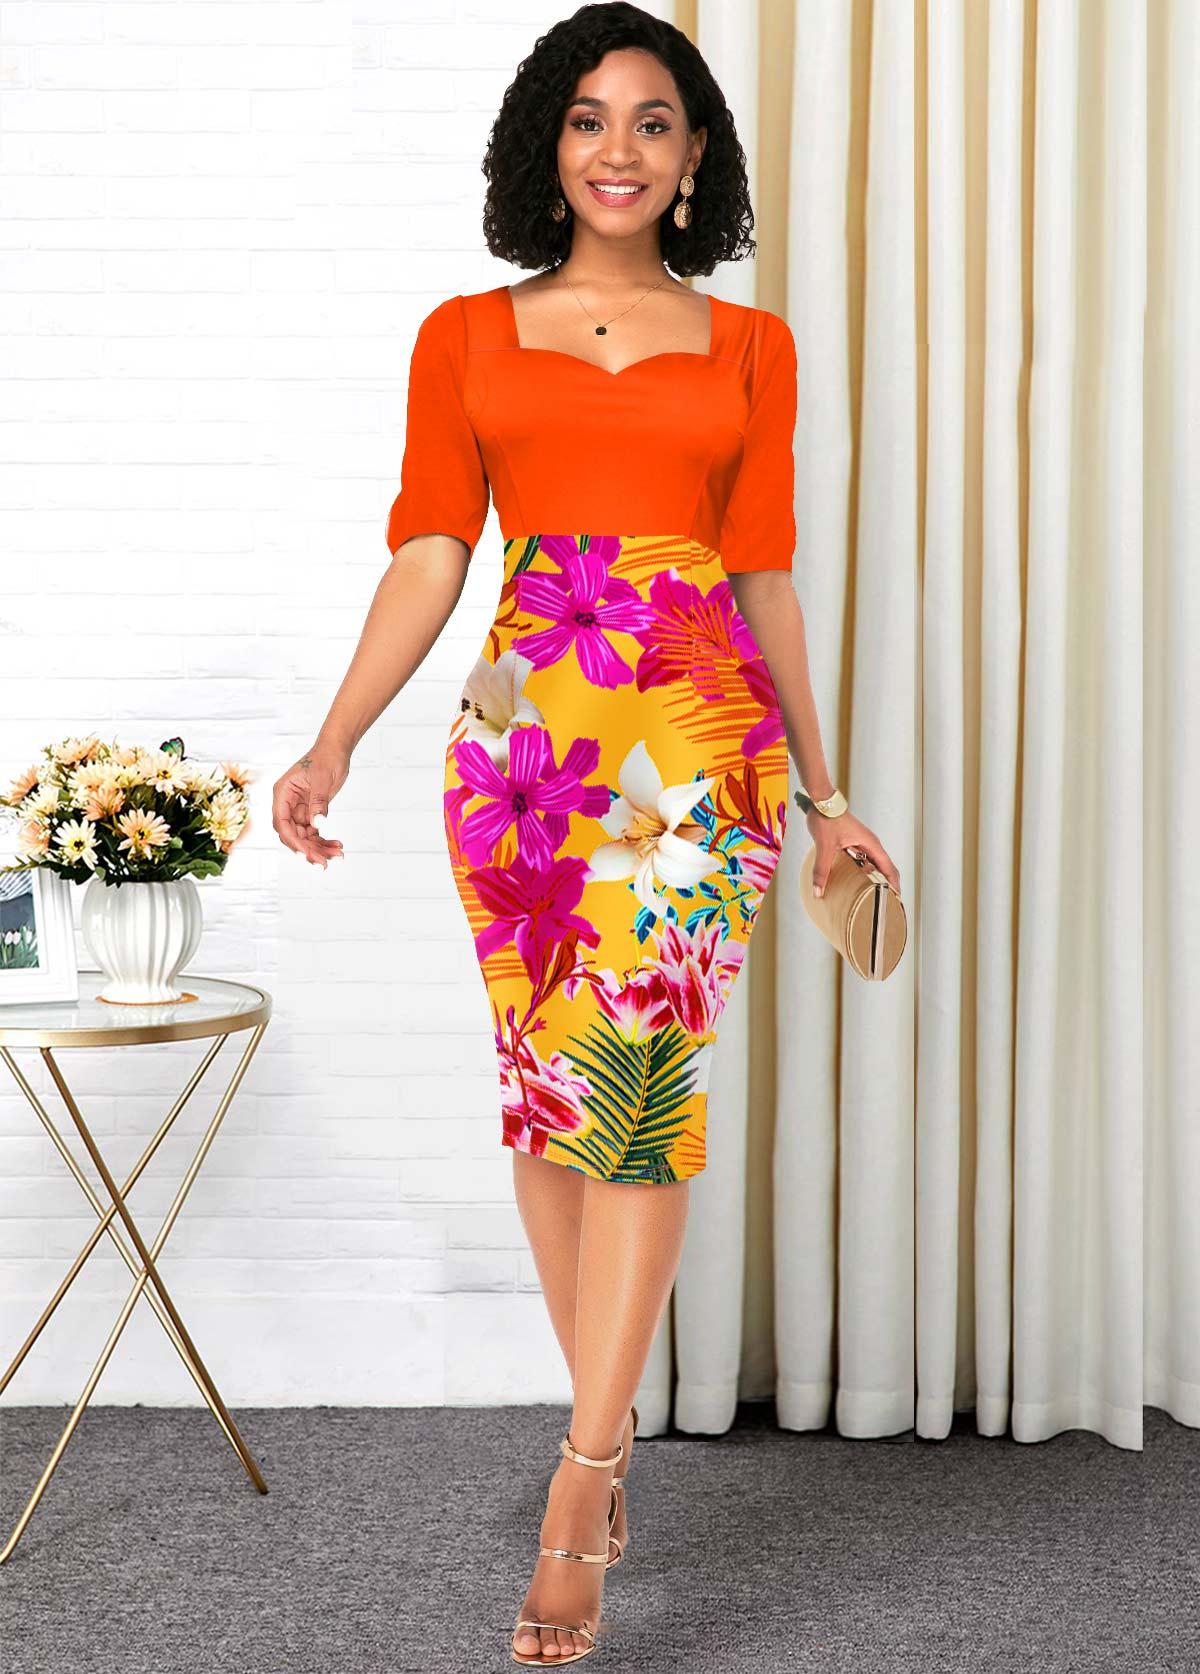 ROTITA Floral Print Half Sleeve Orange Contrast Dress